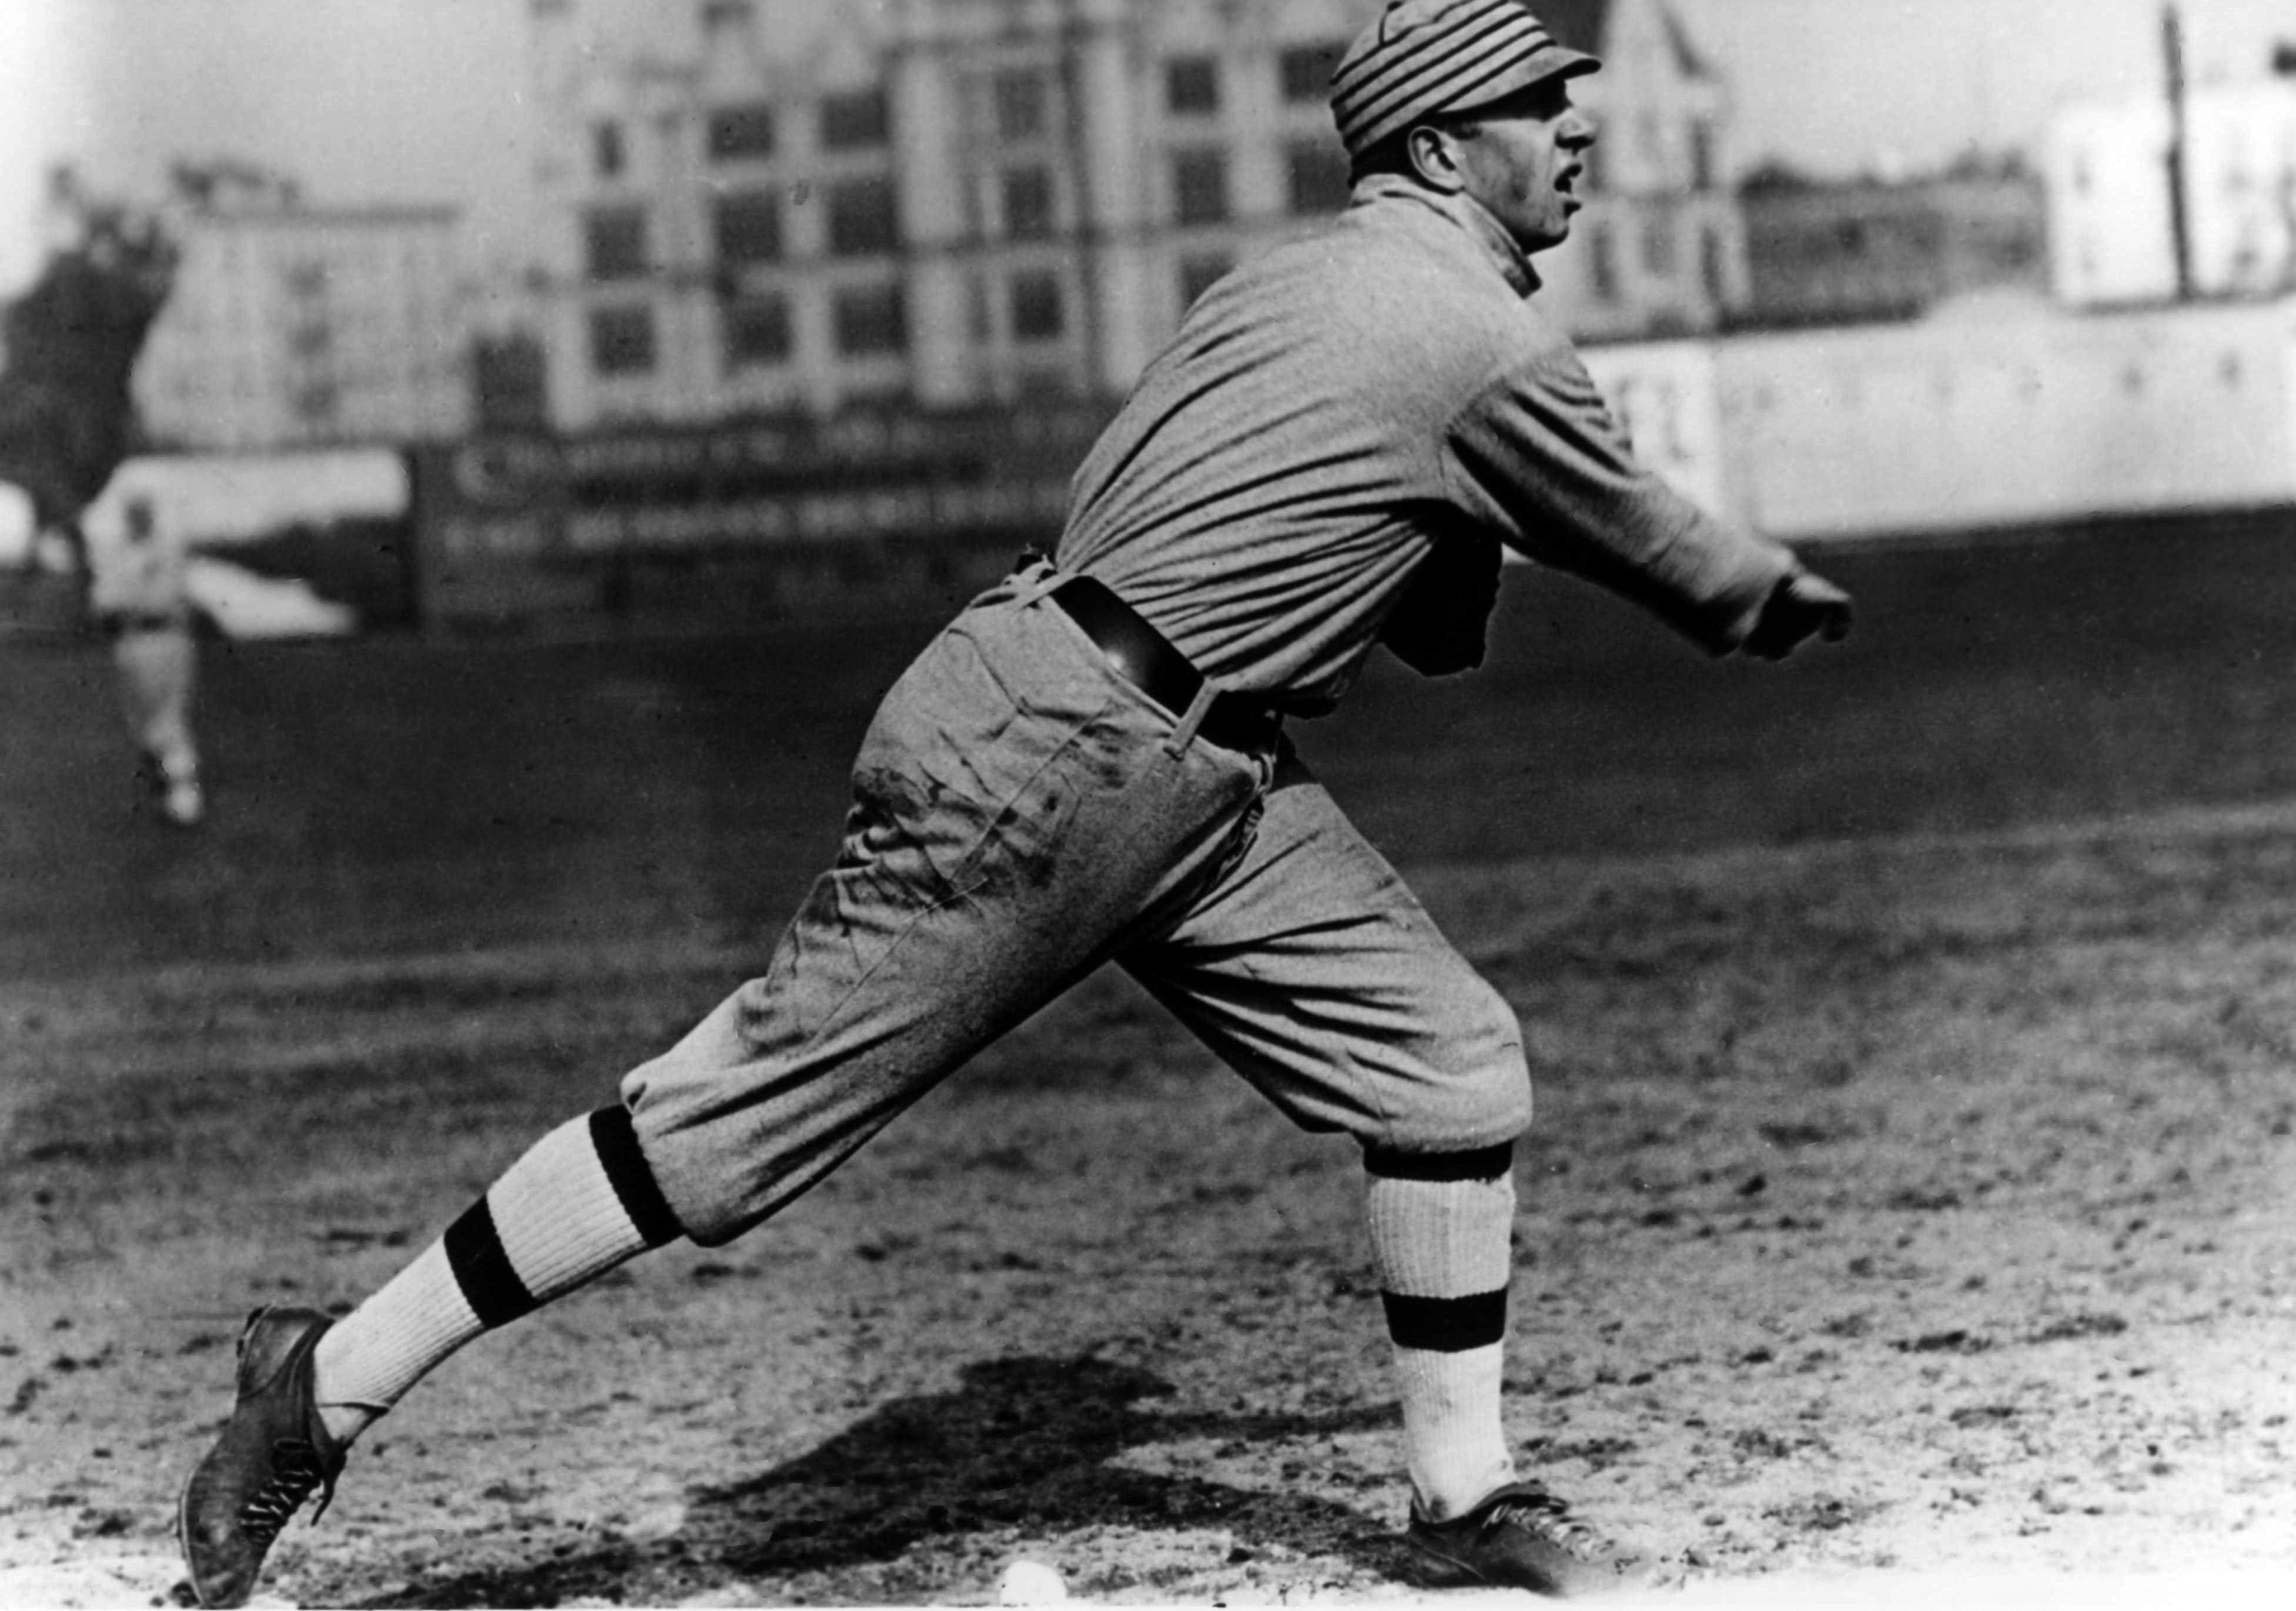 LATE 1920'S: Philadelphia Athletics player Eddie Collins following through on a throw.